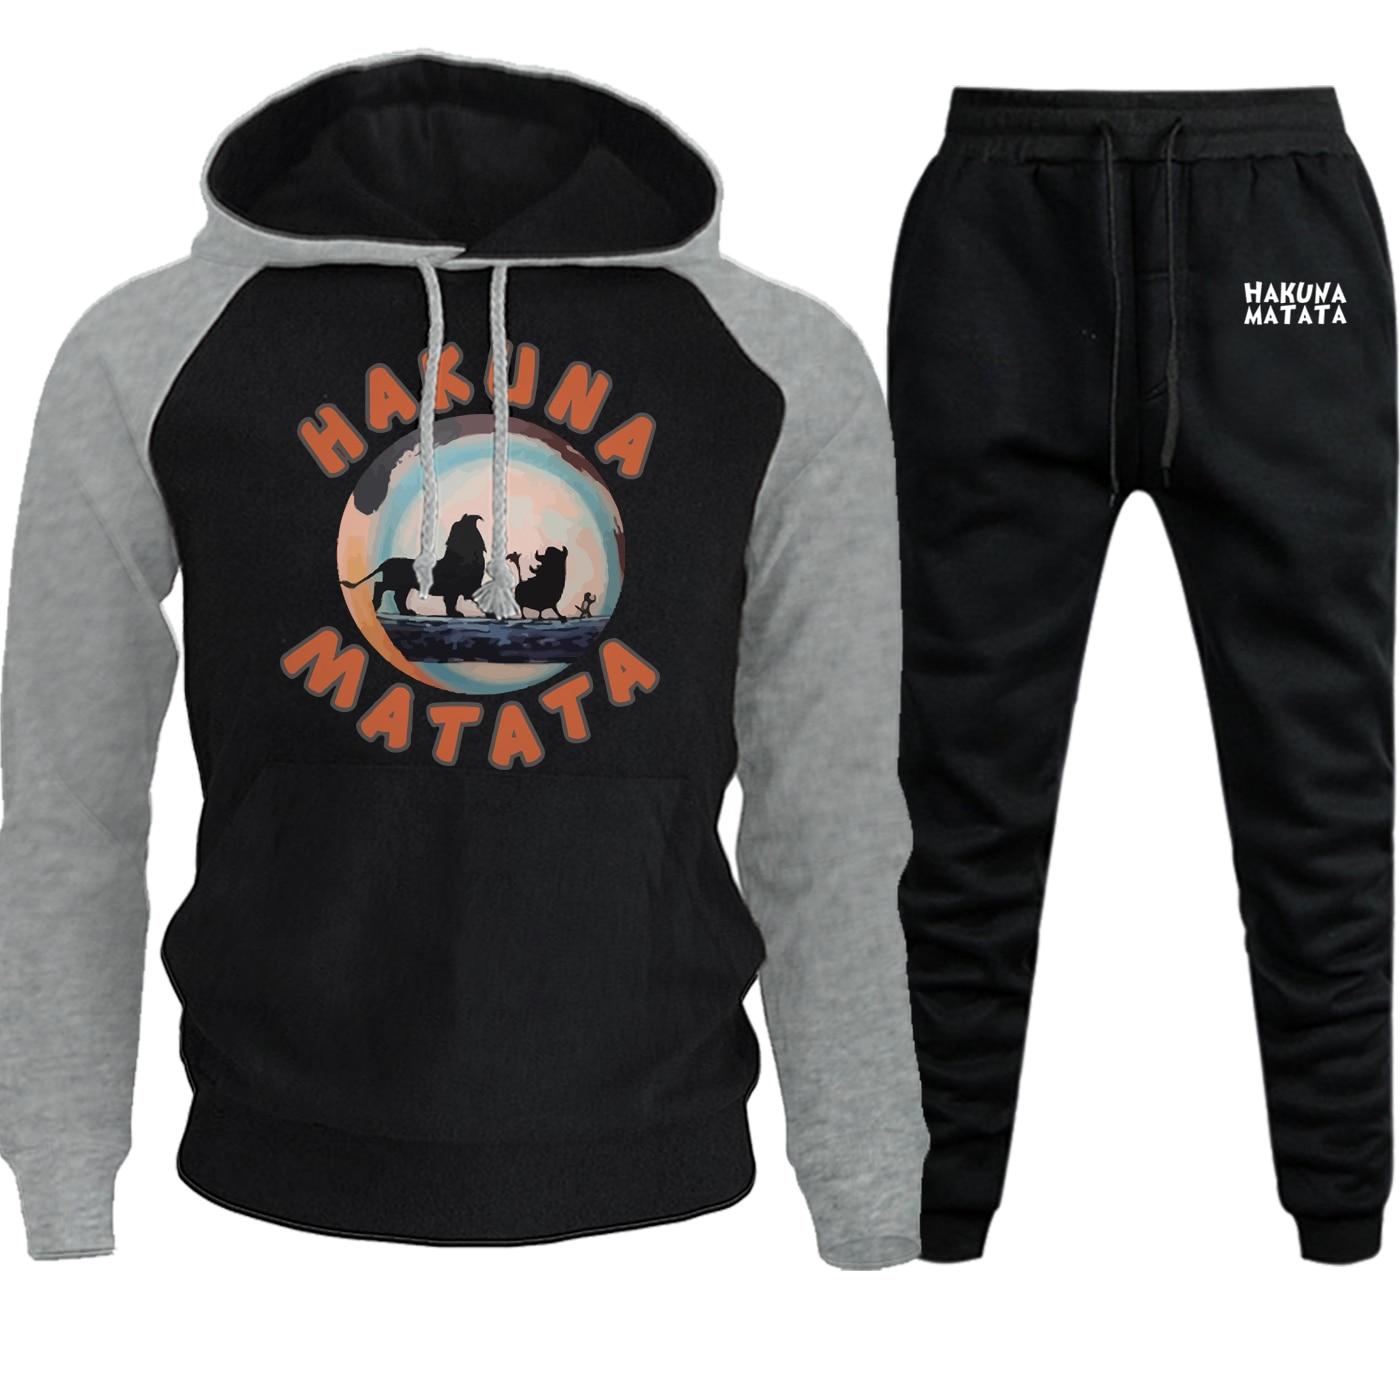 2019 Autumn Winter New The Lion King Sweatshirts Raglan Mens Fleece Hoodies Cartoon Suit Male Casual Pullover+Pants 2 Piece Set